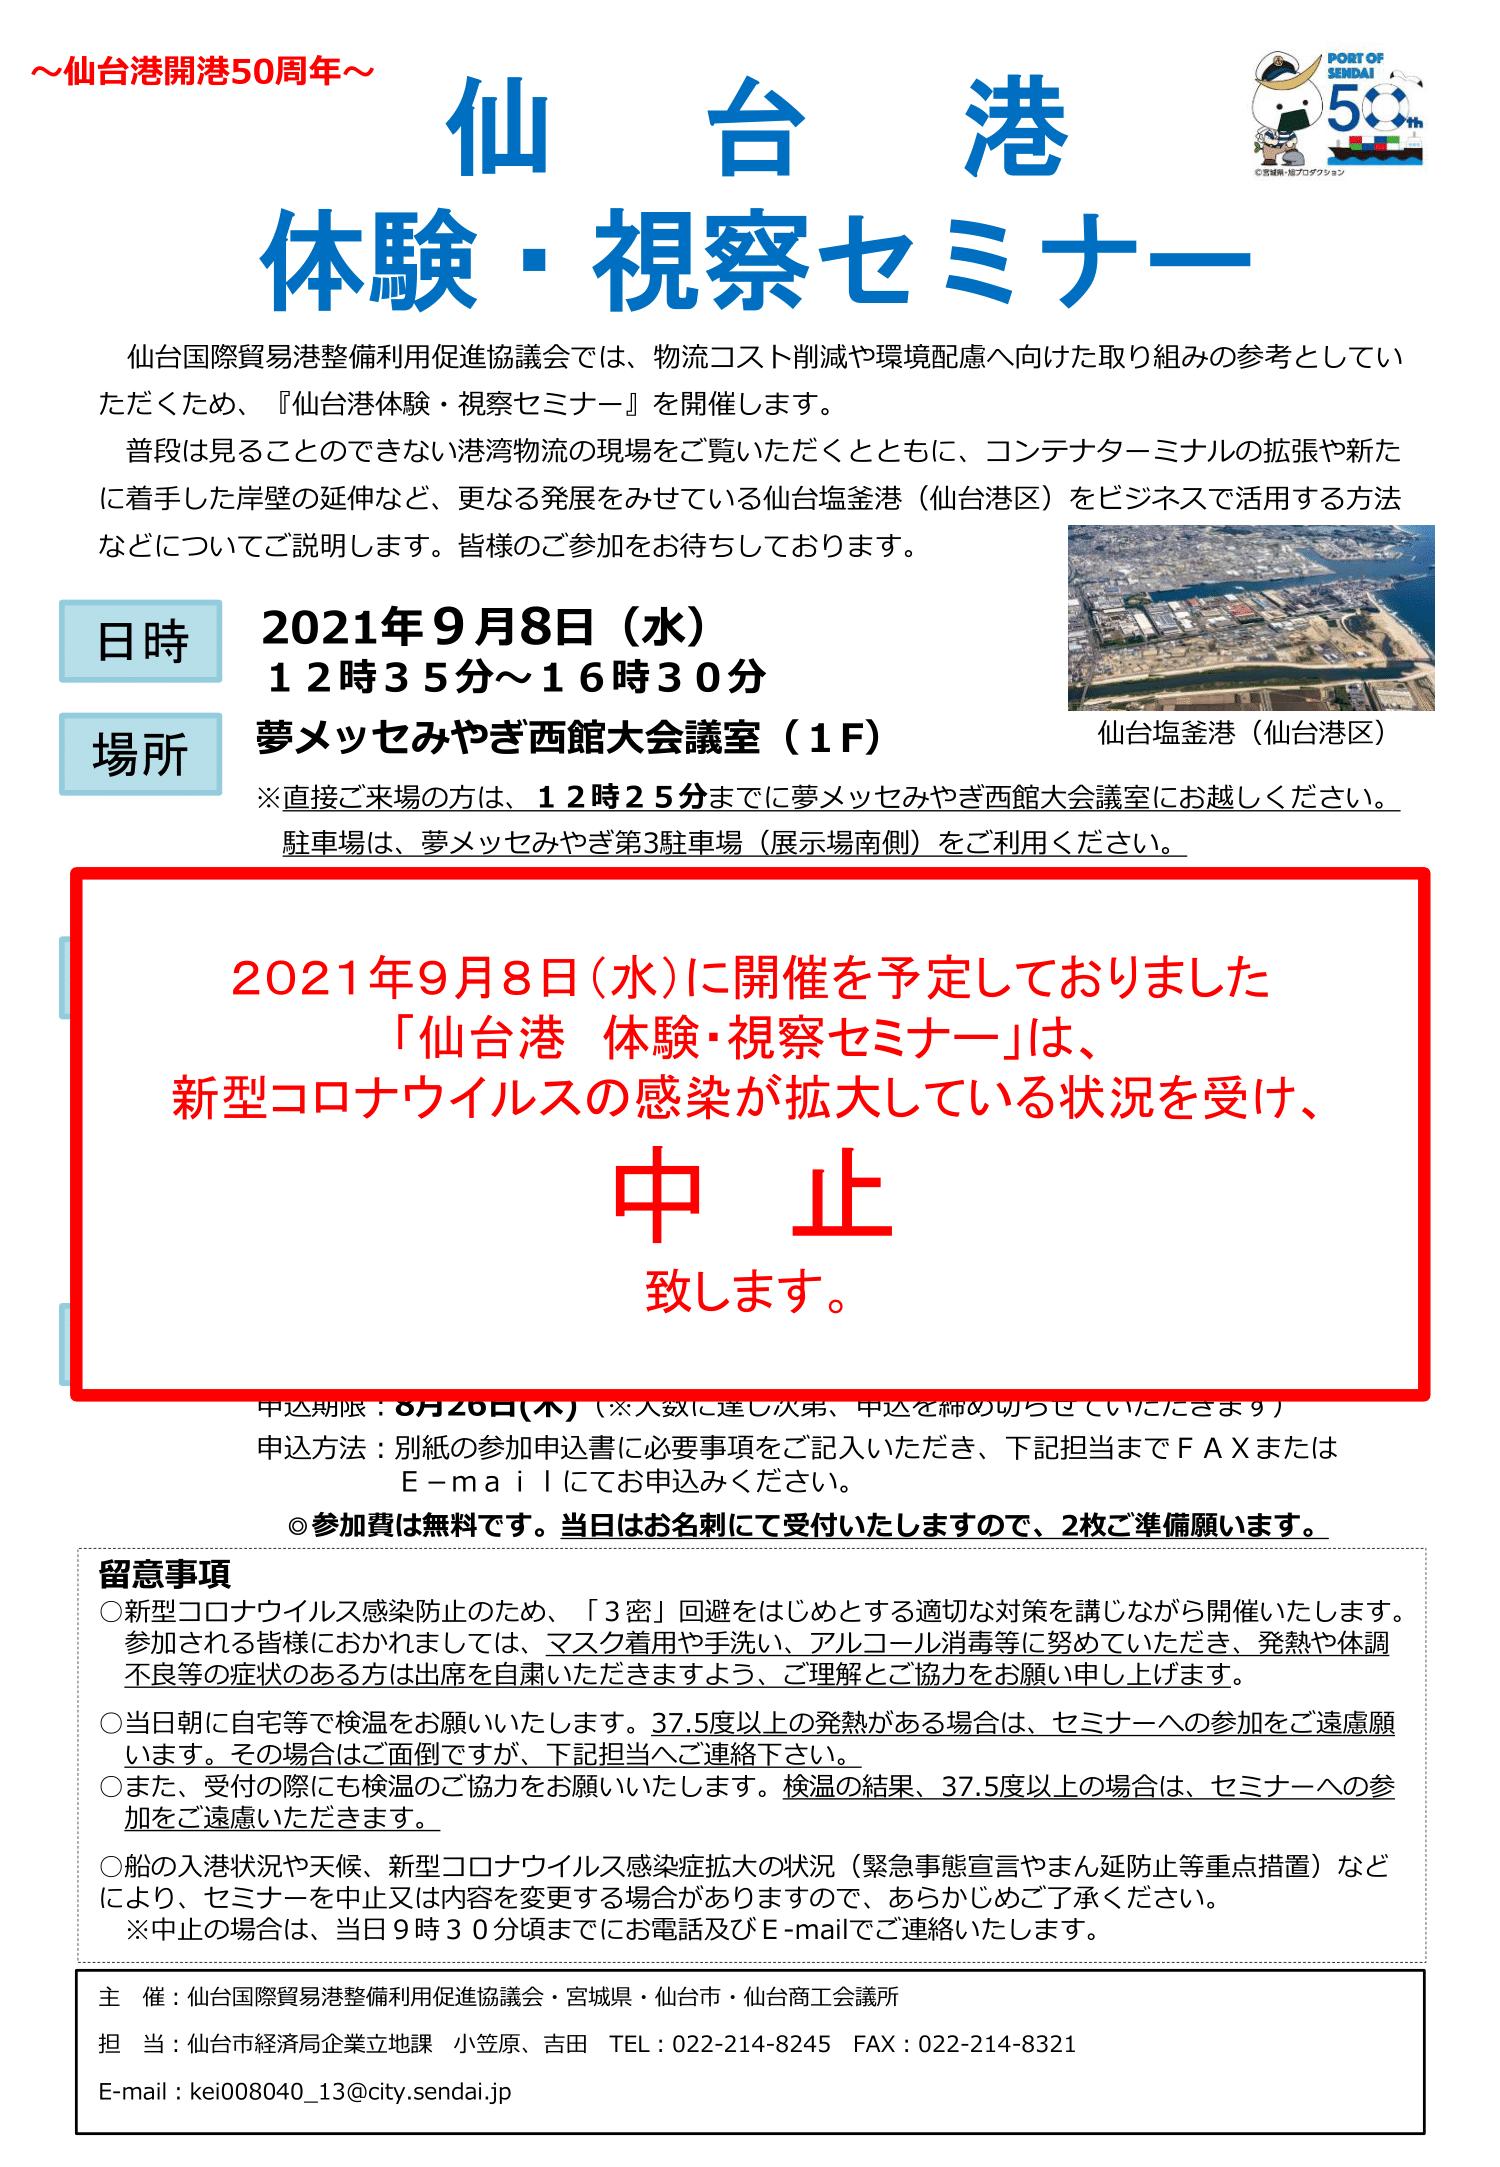 portseminnar20210908_cancele.png